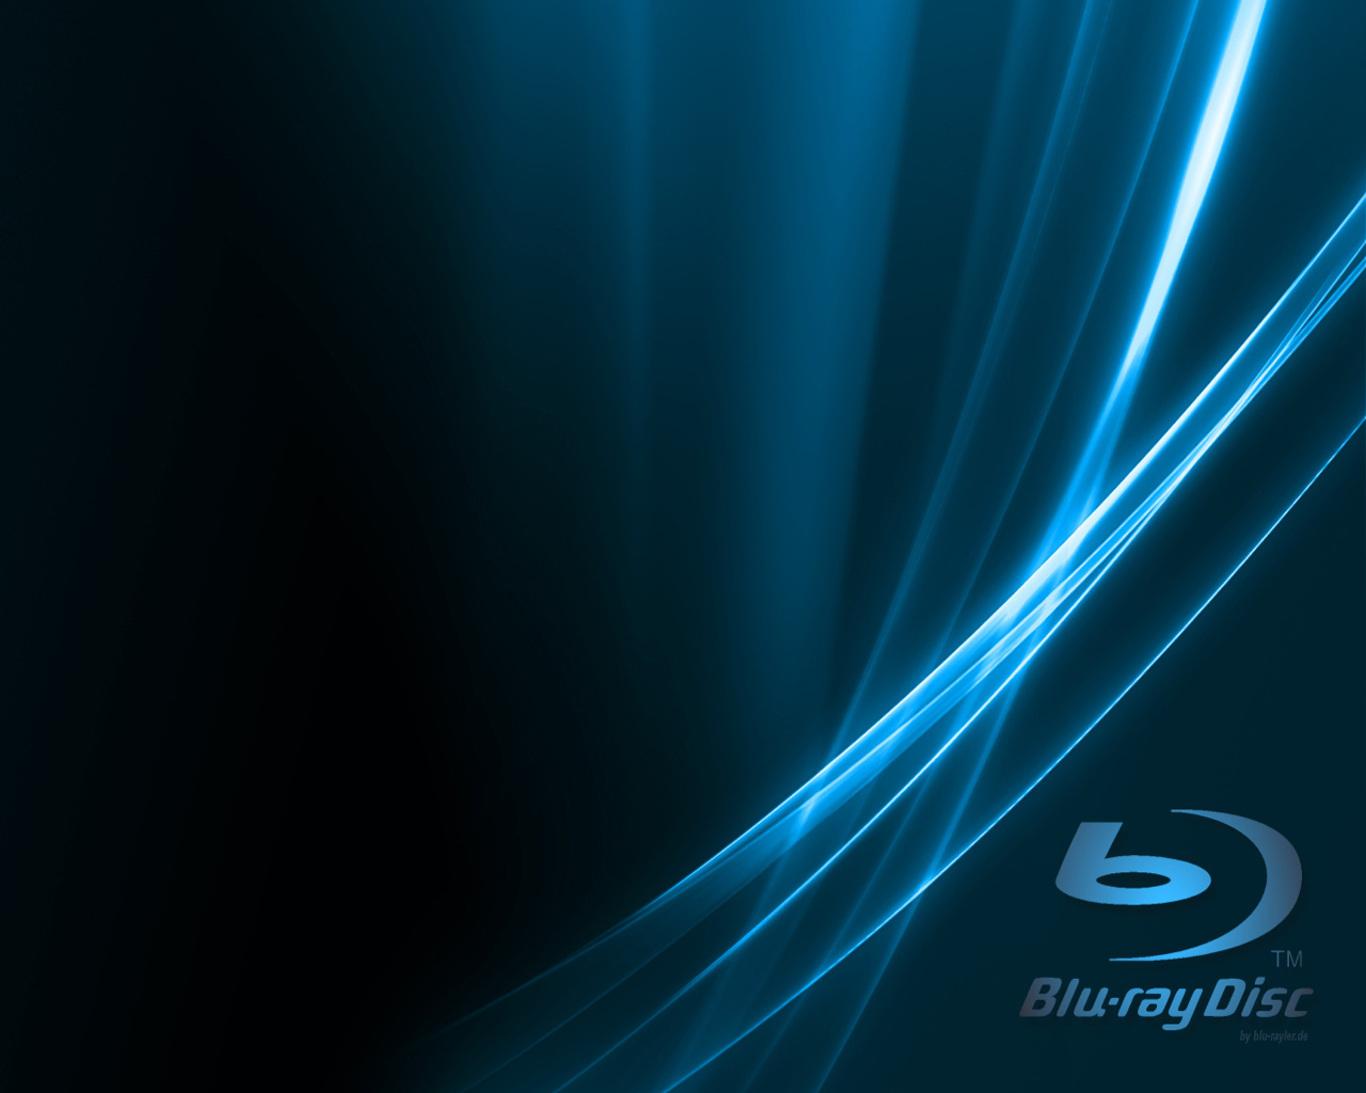 http://2.bp.blogspot.com/-1gApuau9yi0/ToQsOJ4vu4I/AAAAAAAAADY/pK0eKedbzjI/s1600/Blu+Ray+Wallpapers+%252829%2529.jpeg